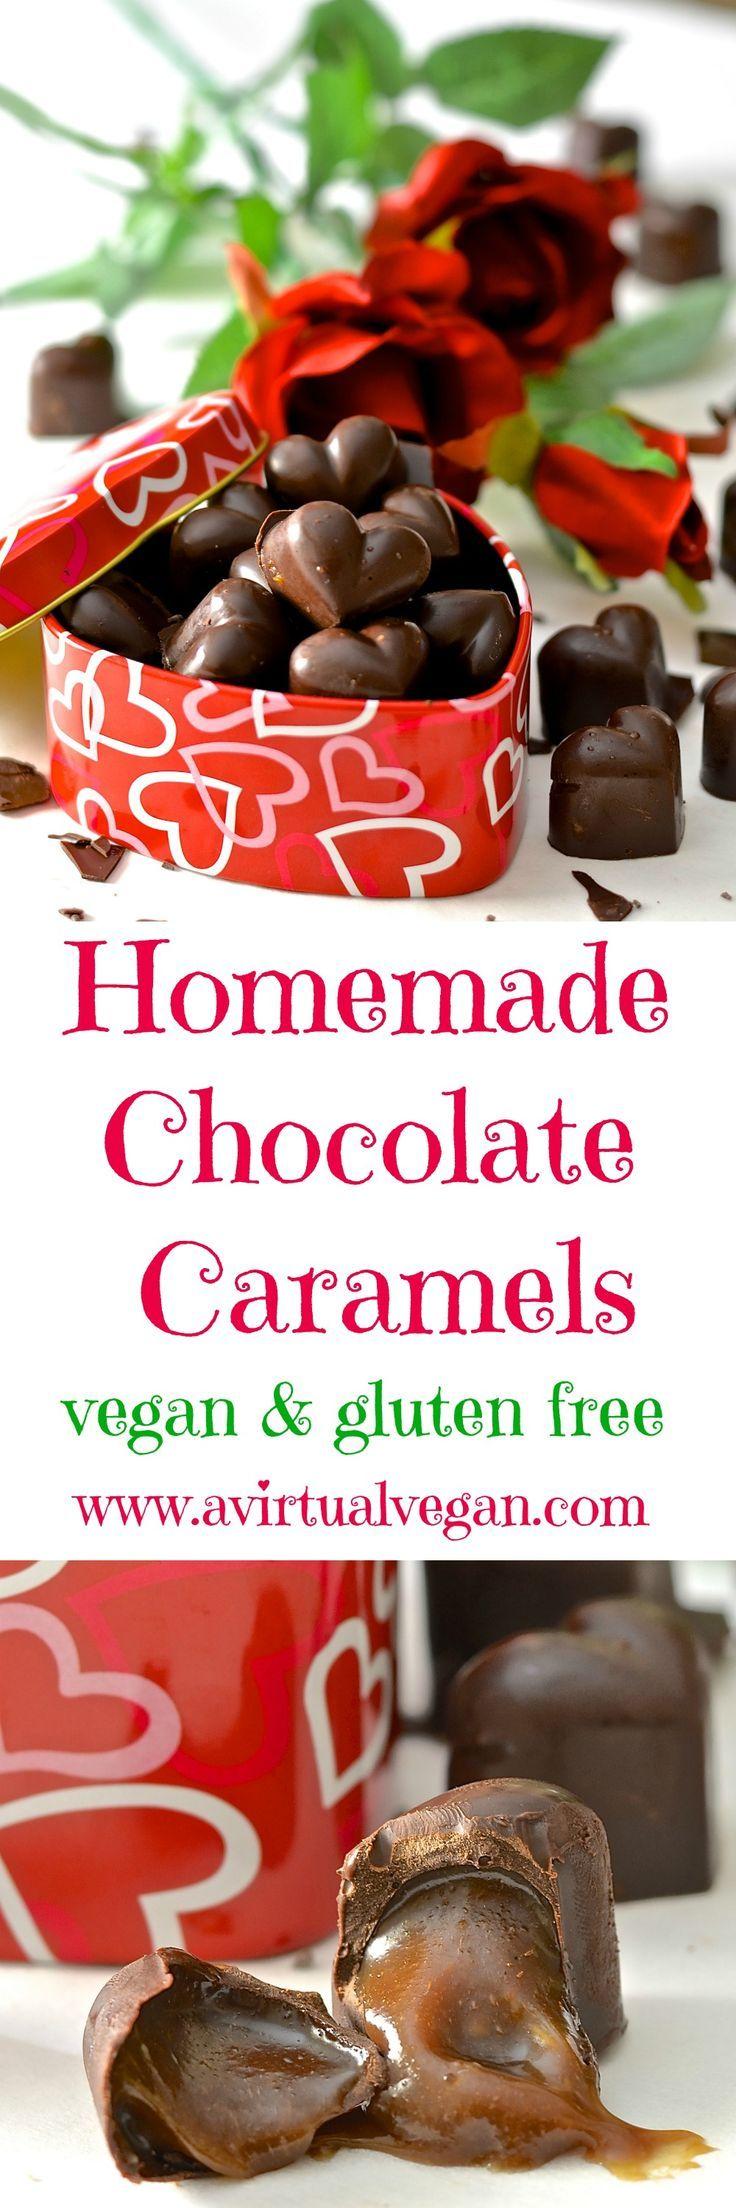 Rich & gooey homemade vegan chocolate caramels